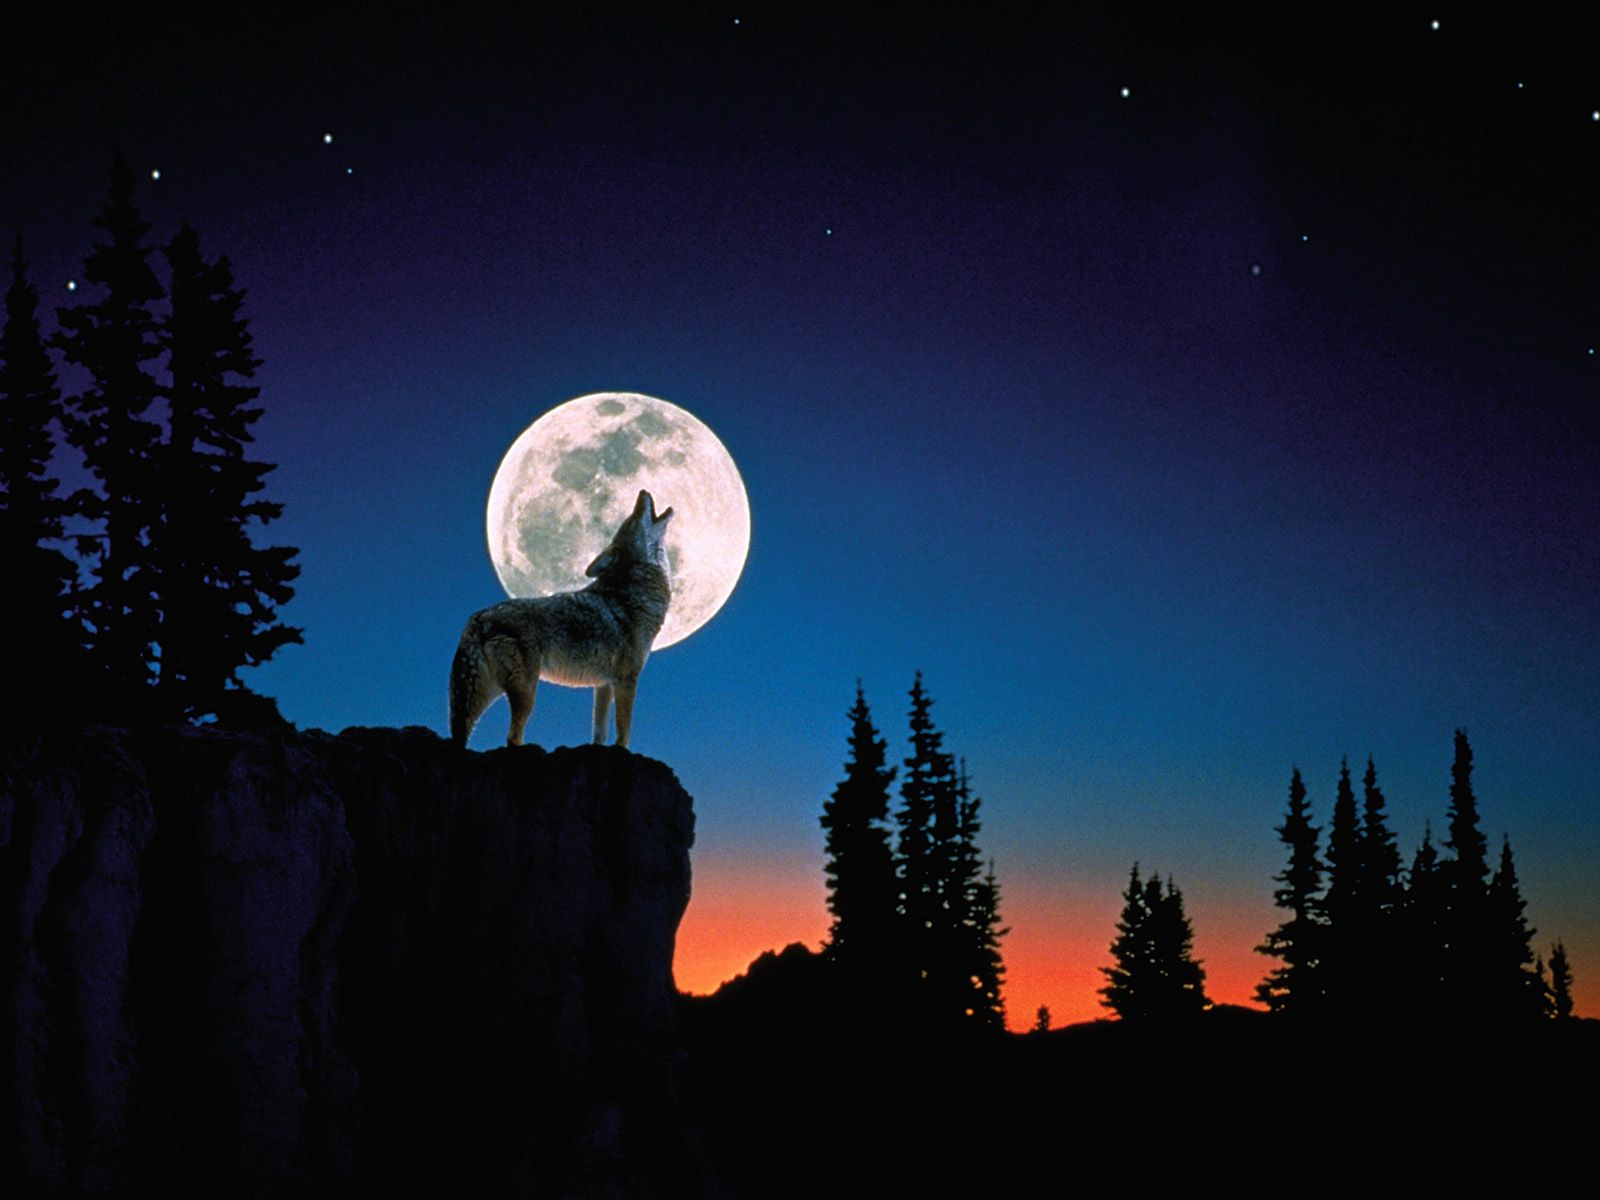 Iphone wallpaper tumblr wolf - Wolf Howling Full Moon Desktop Wallpaper